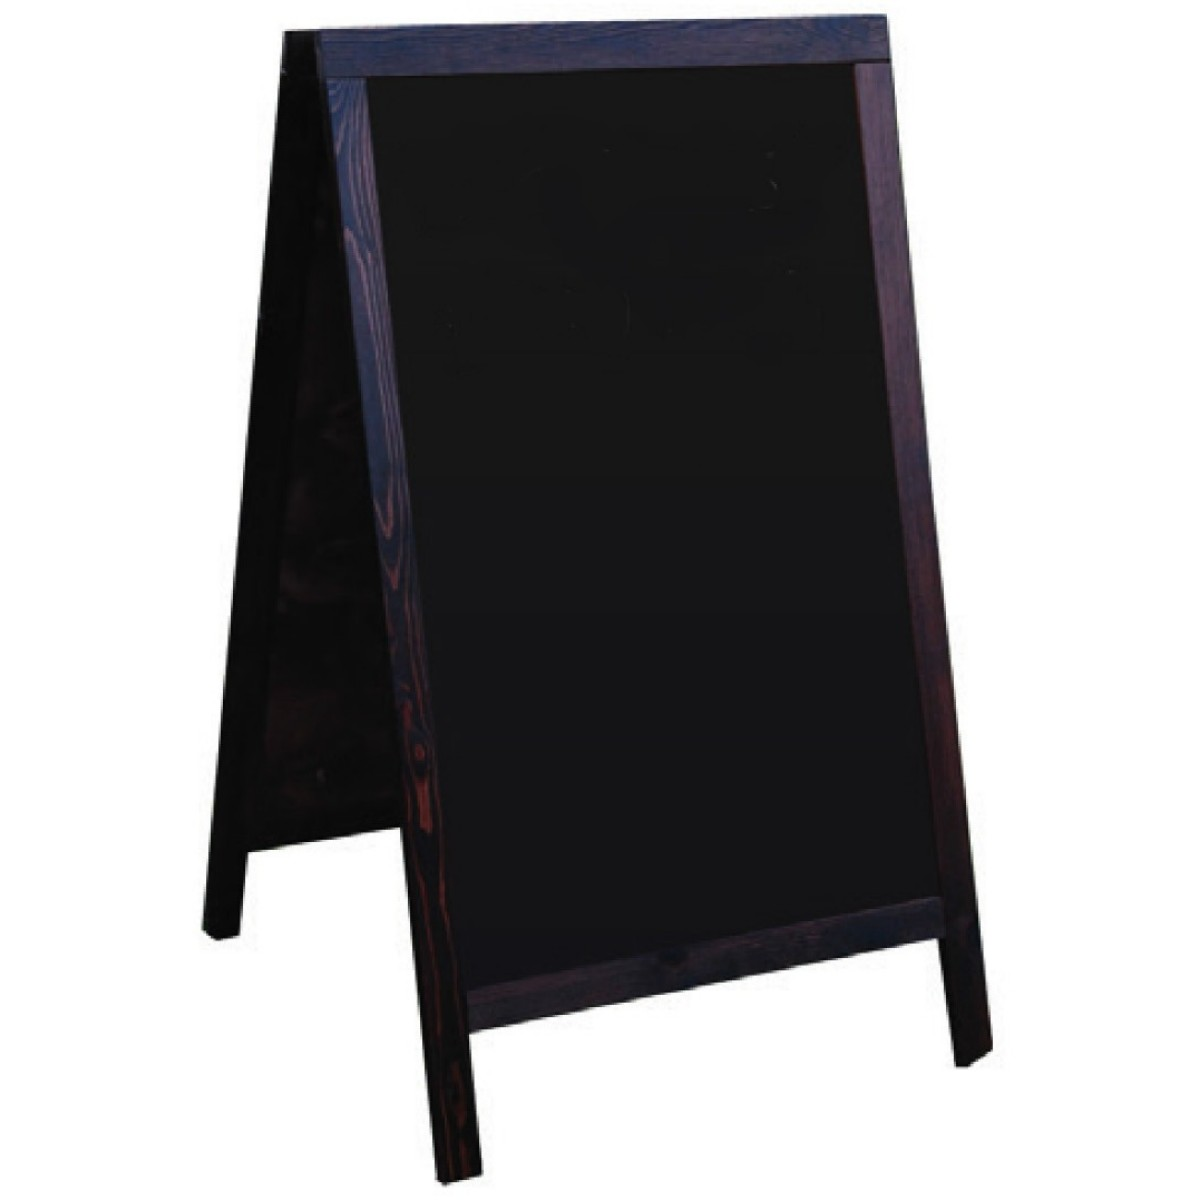 Tabule informa n 130 x 90 cm for Finestra 90 x 130